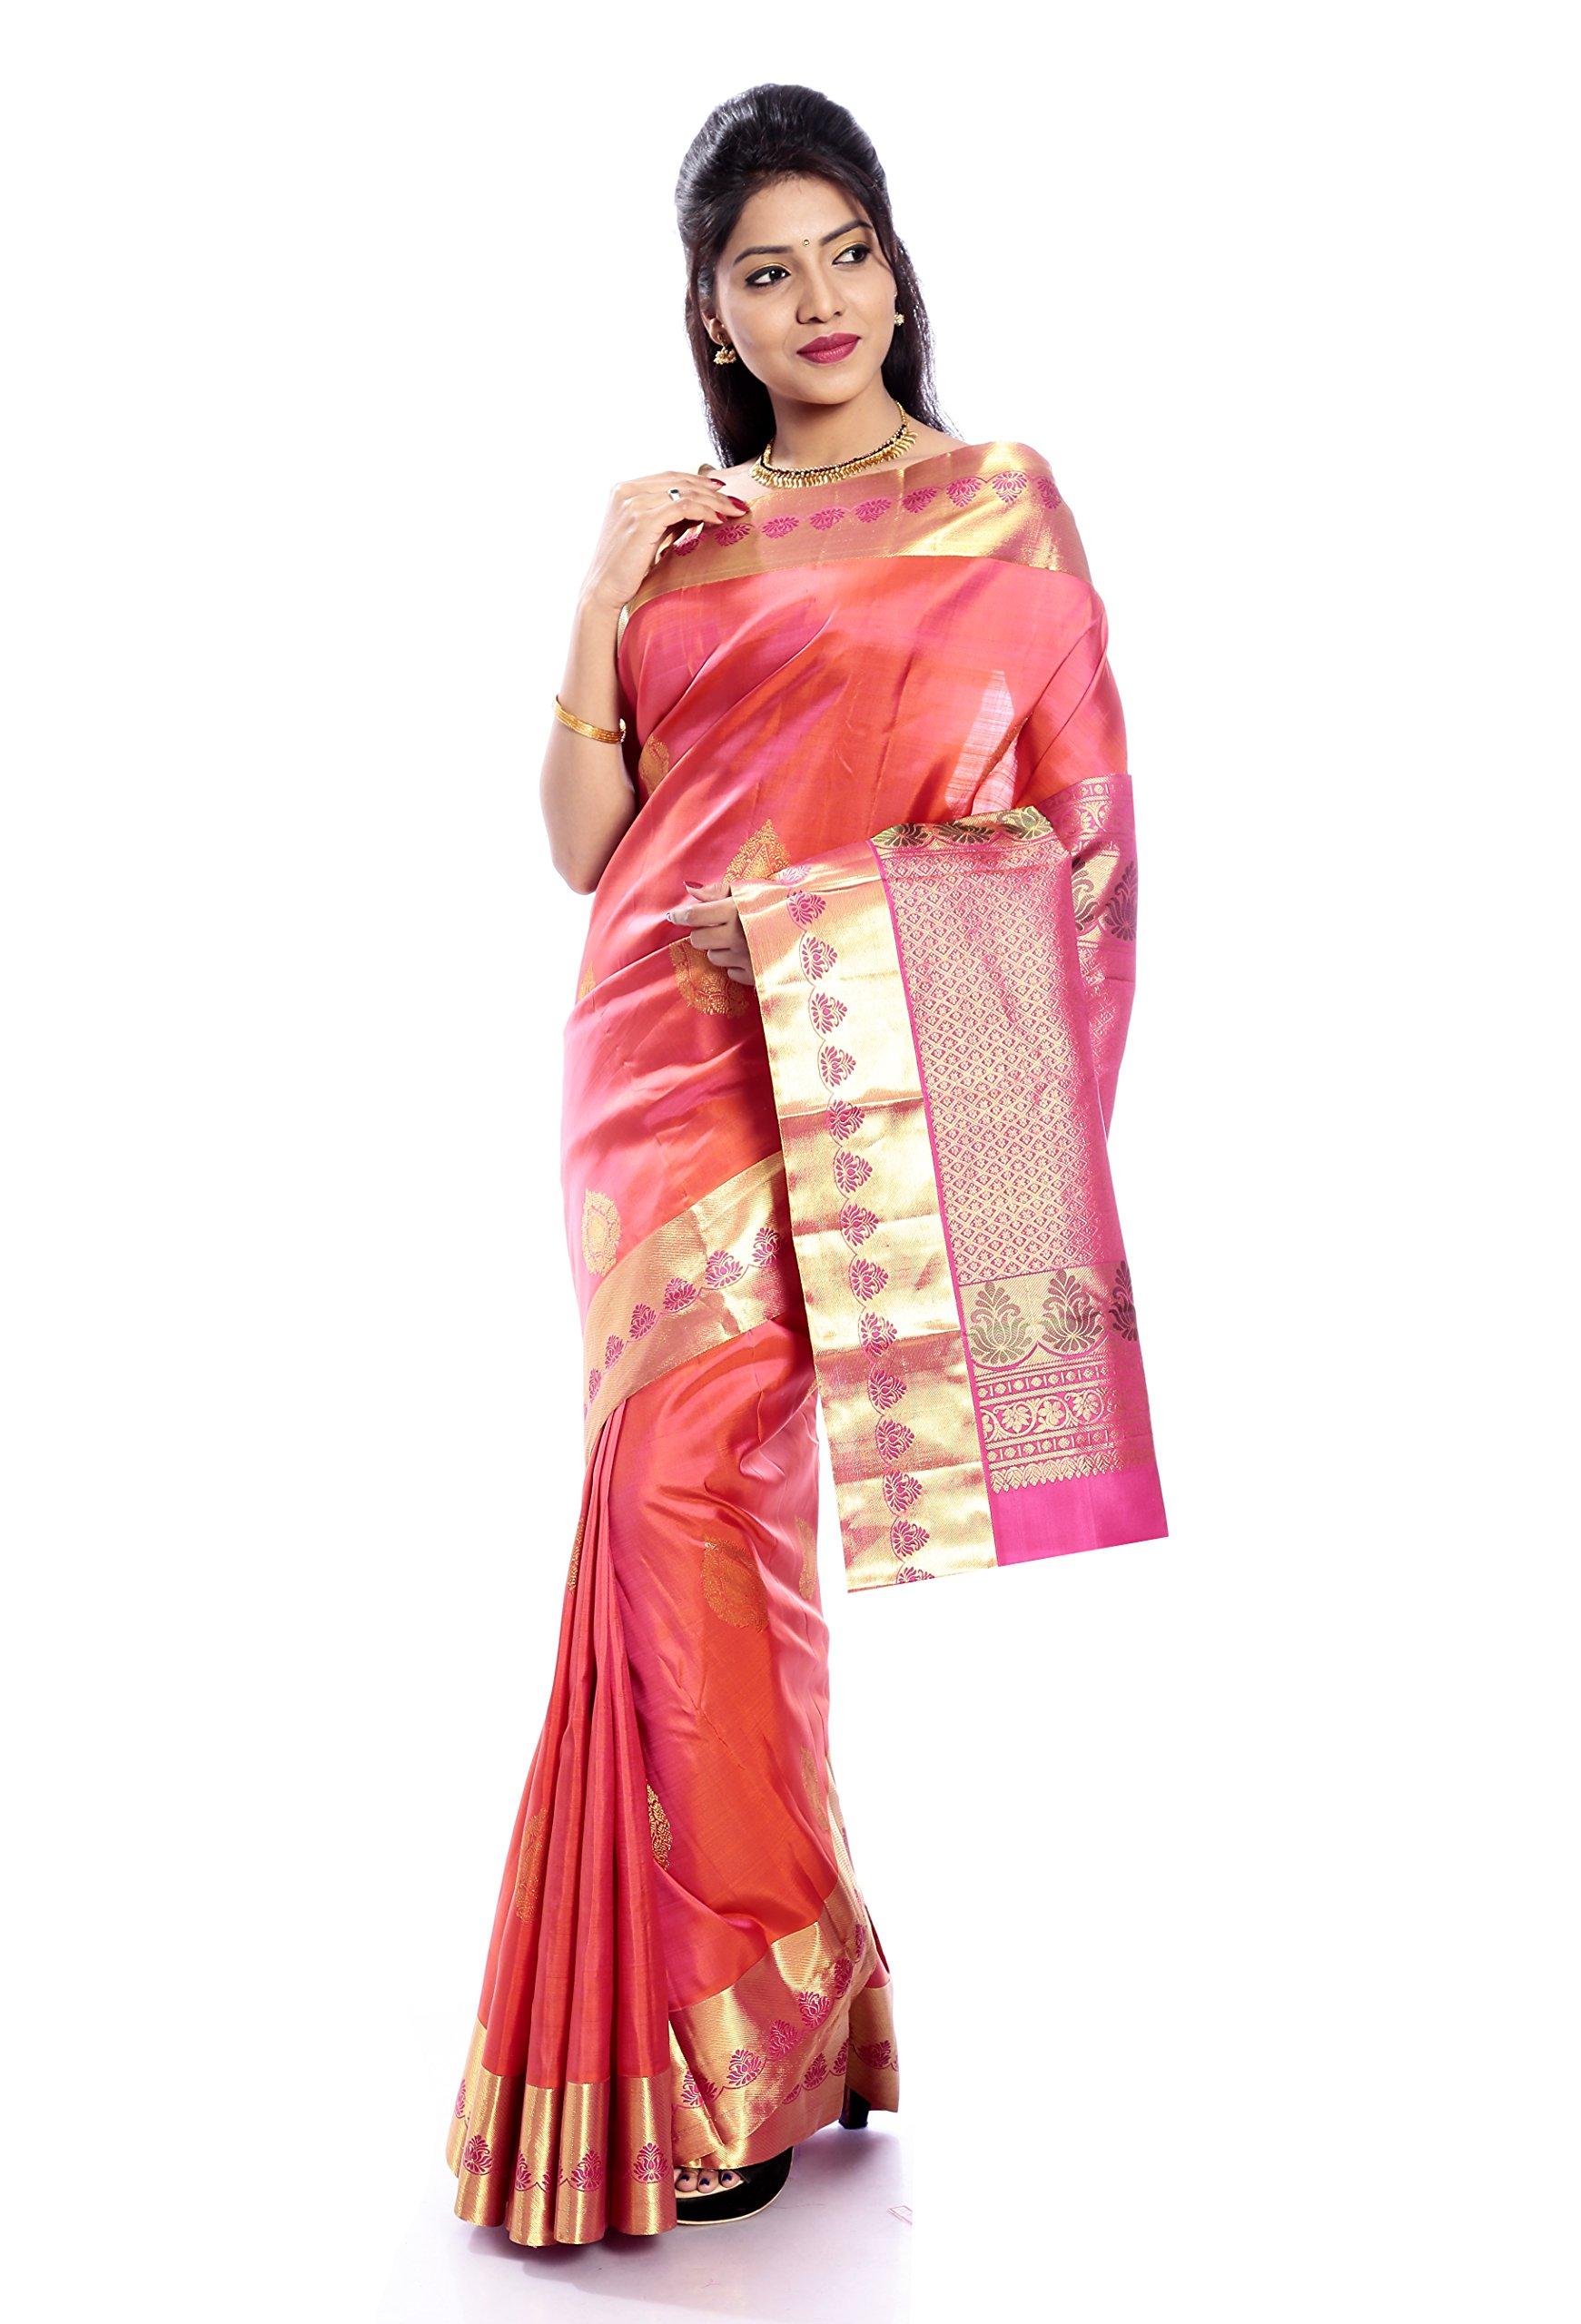 Mandakini — Indian Women's Kanchipuram - Handloom - Pure Silk Saree (Orange pink ) (MK224)